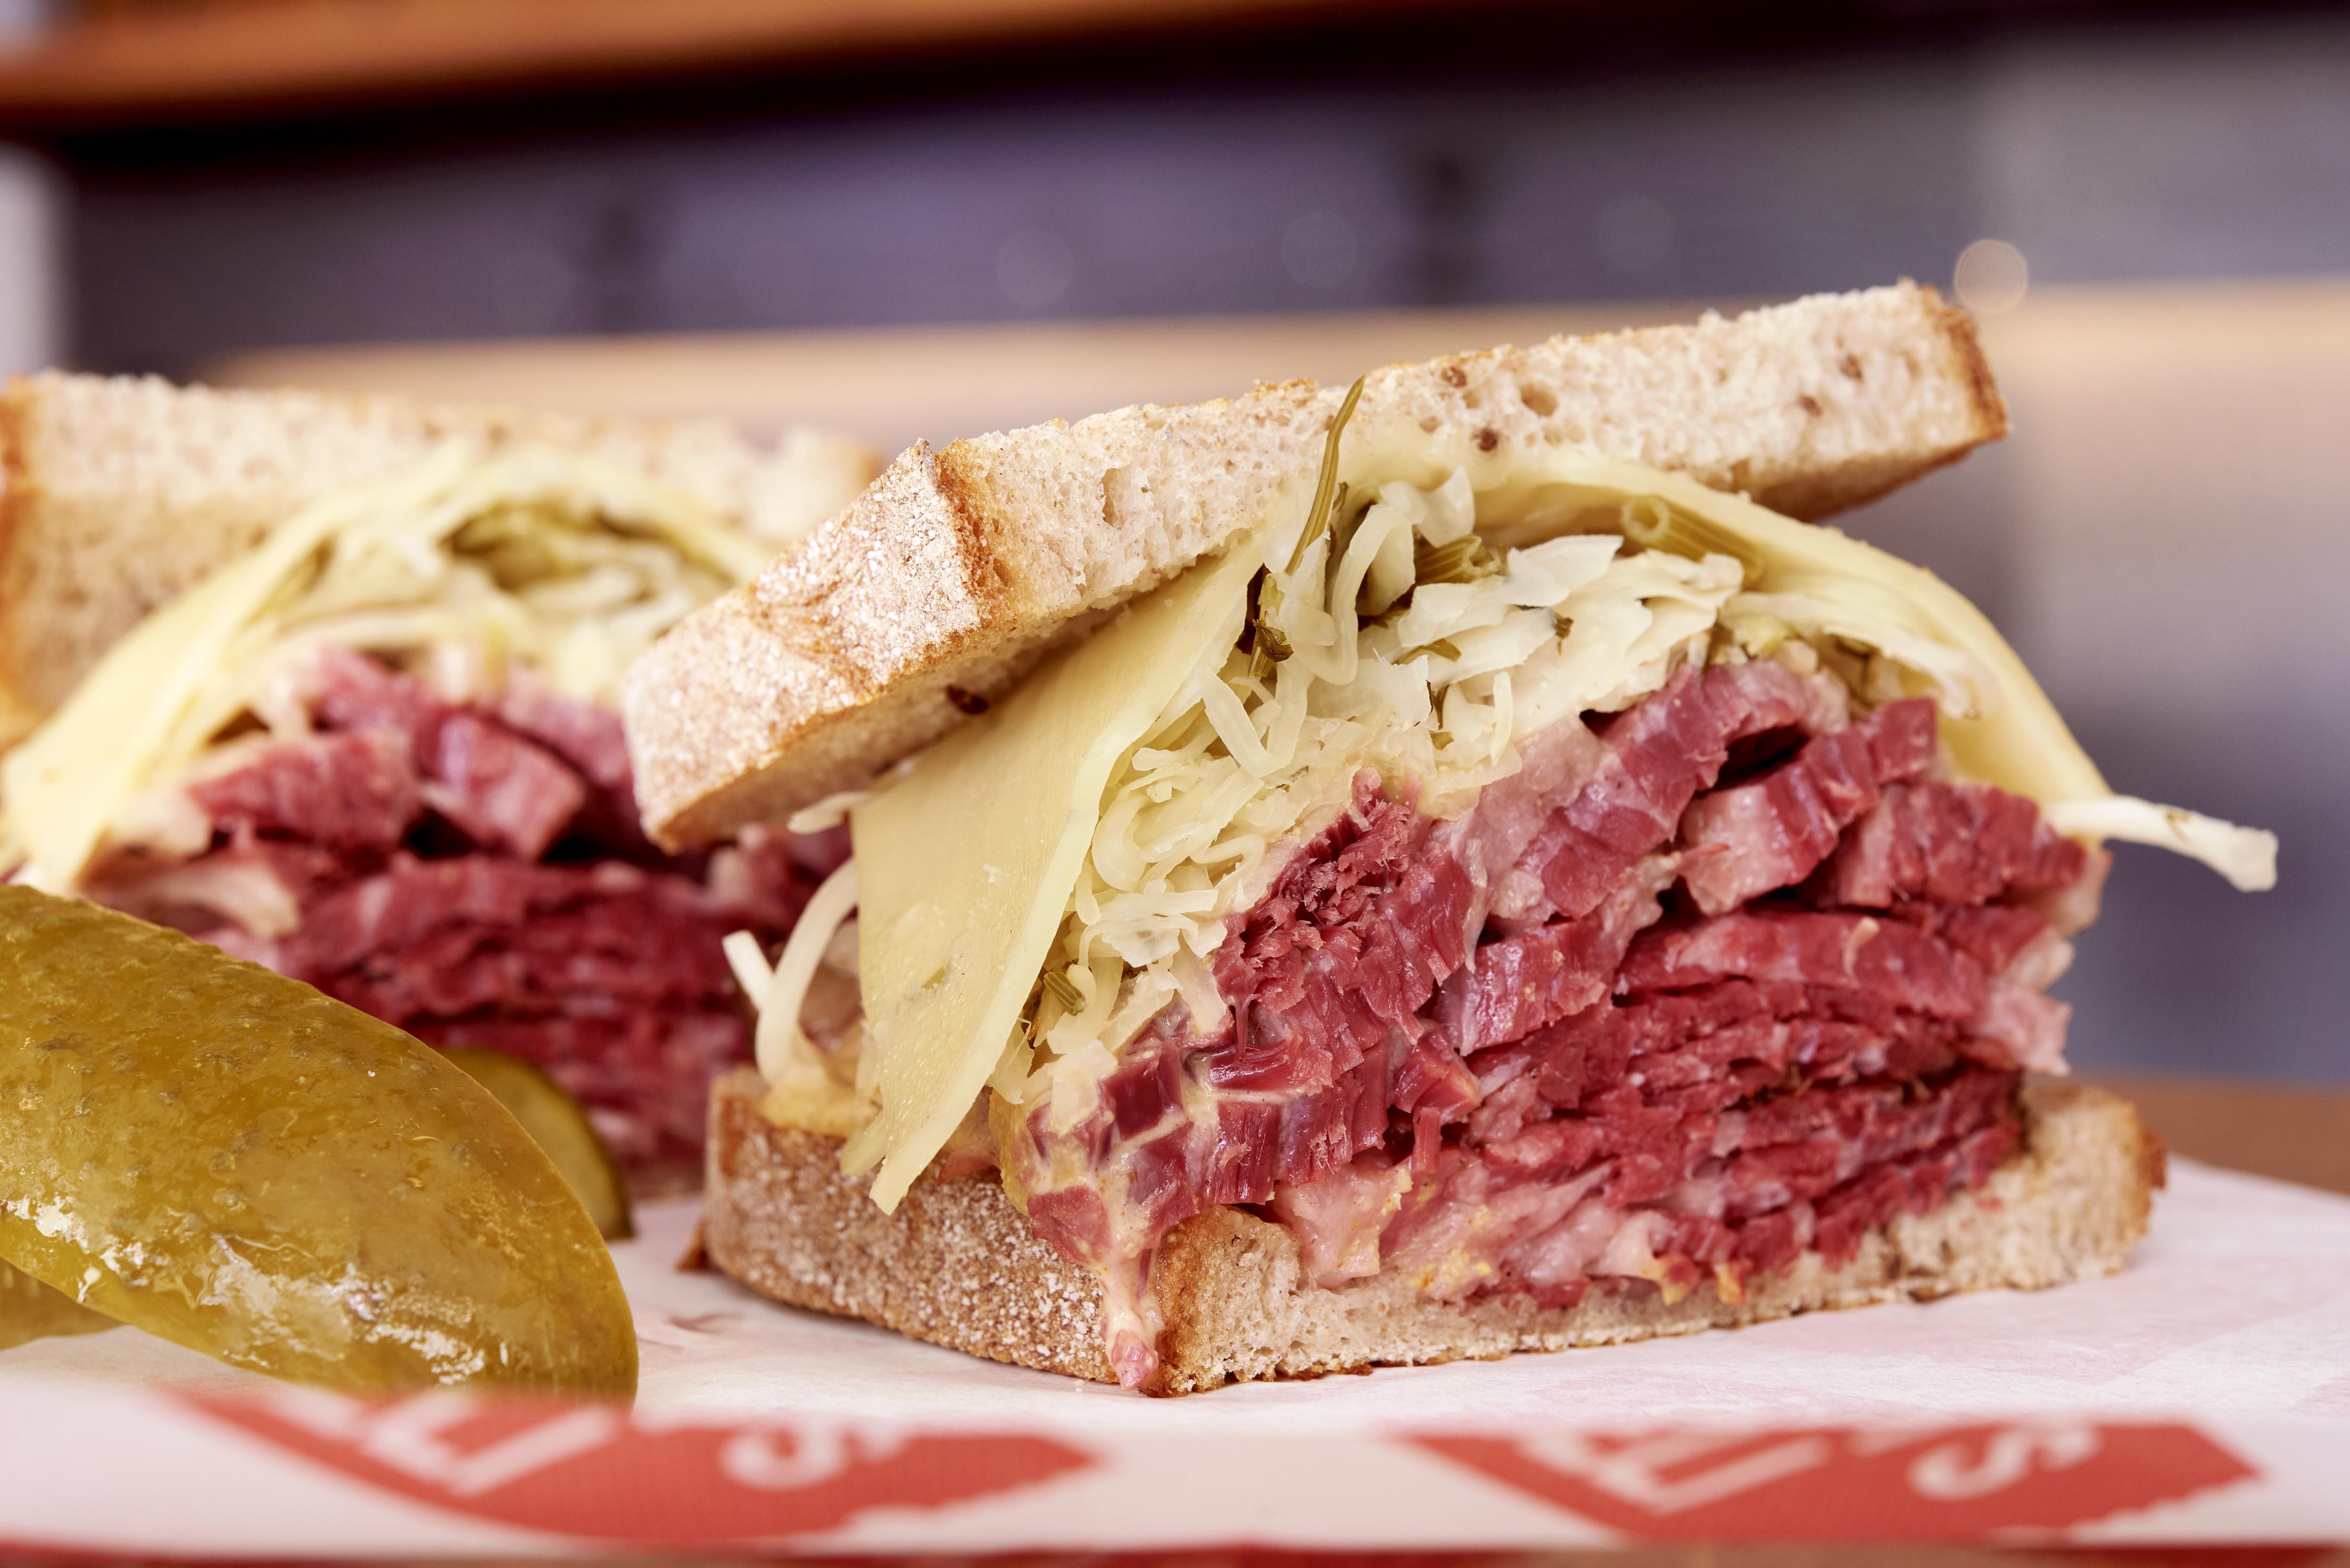 Monty's Deli salt beef sandwich with cheese and gherkin